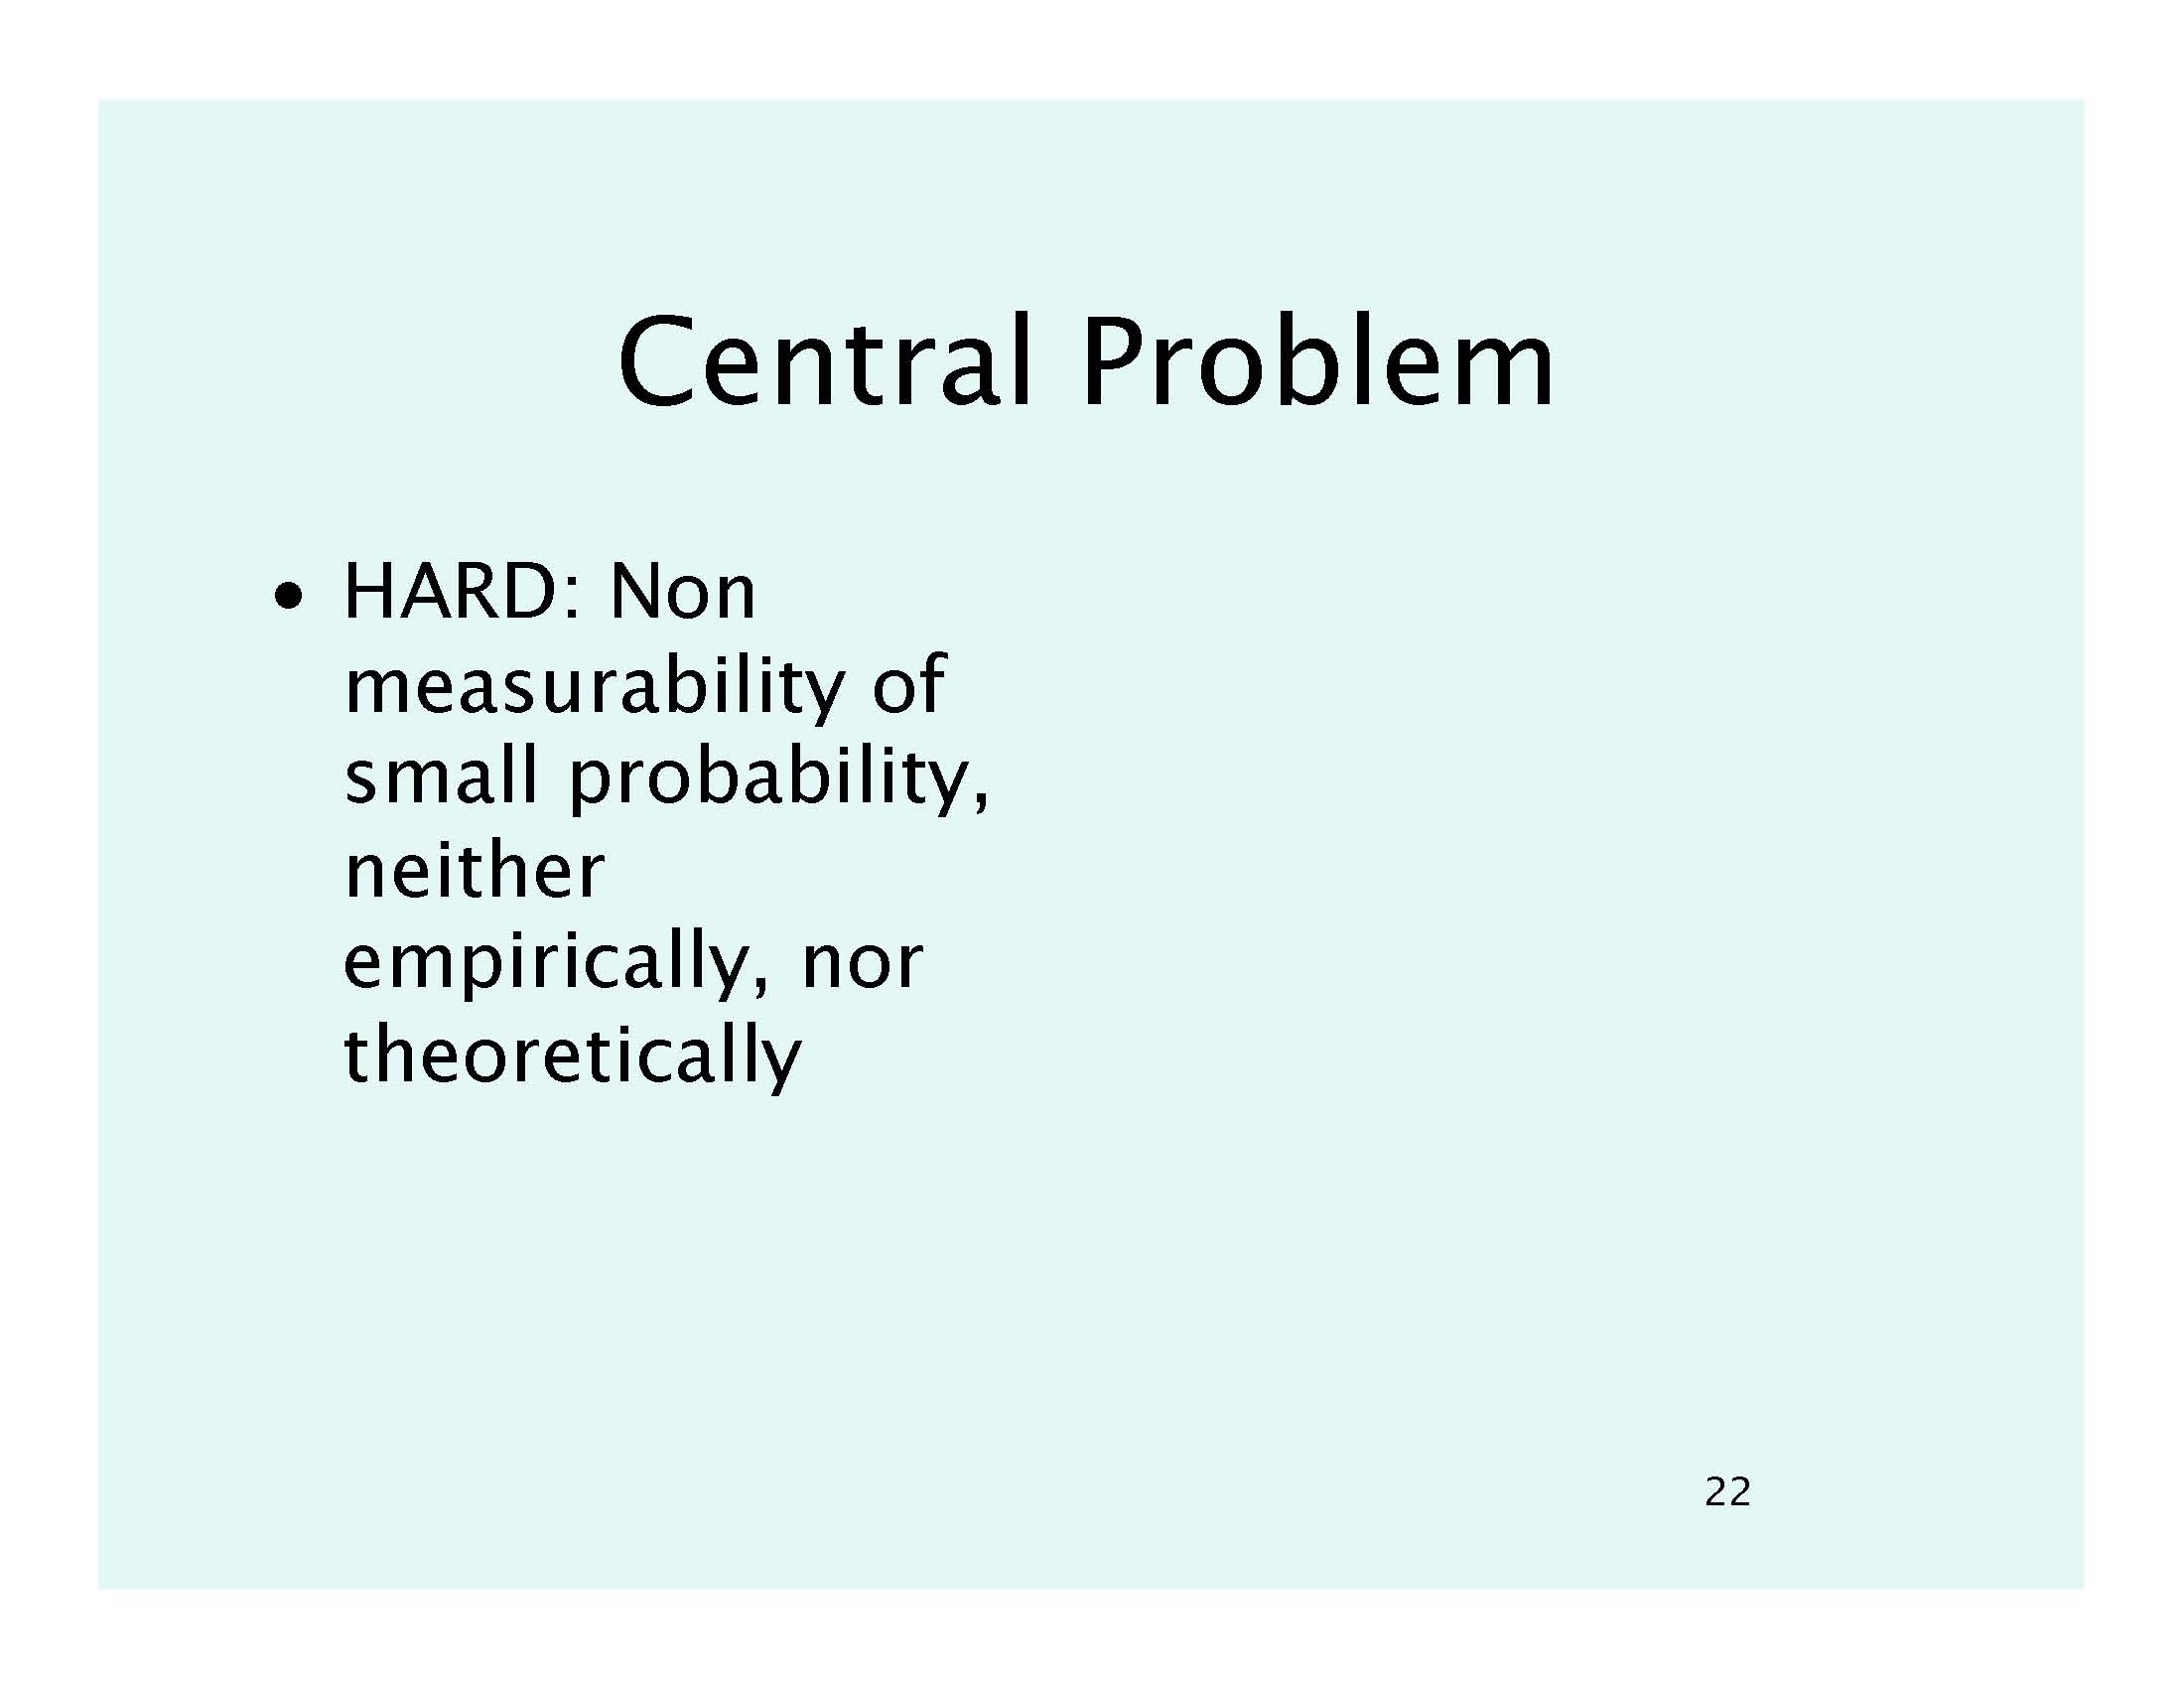 THE HARD PROBLEM | Edge org